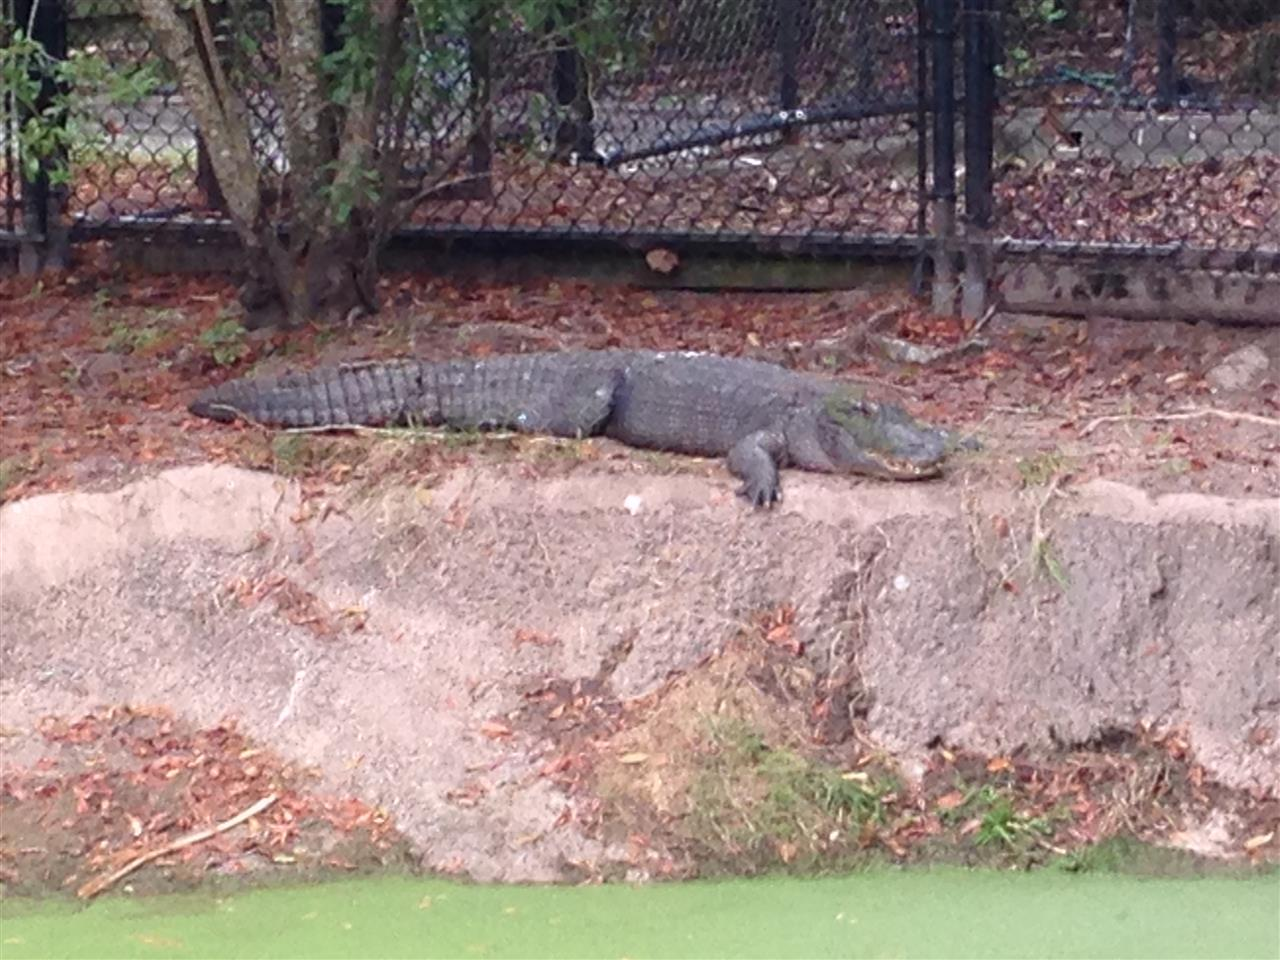 American Alligator #leadingrelocal #jaxzoo #gogators